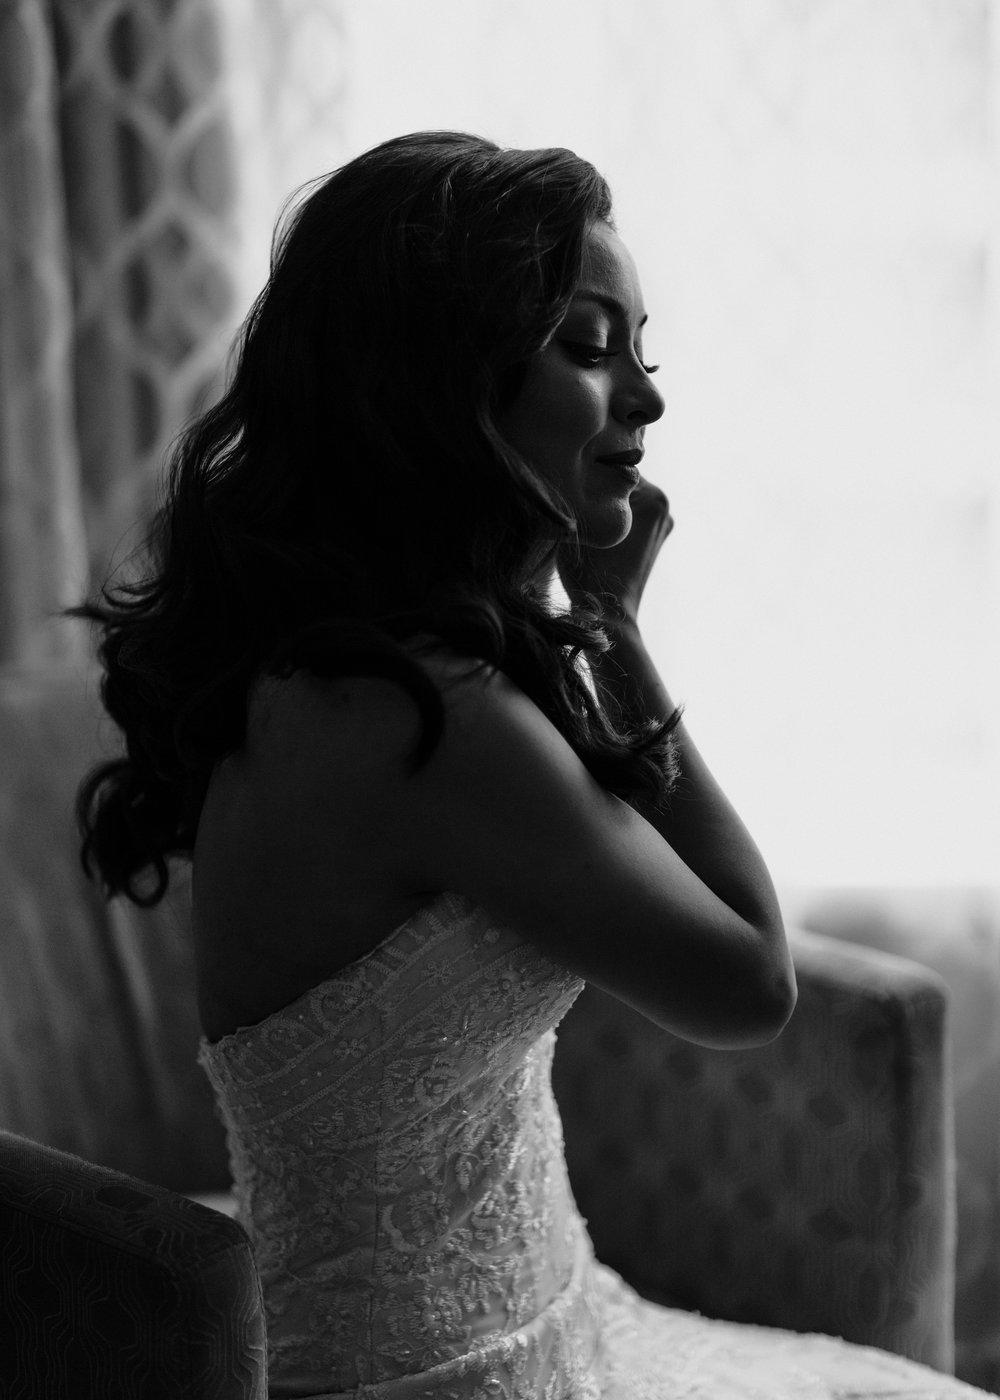 herafilms_wedding_trina_andy_hera_selects-15.jpg